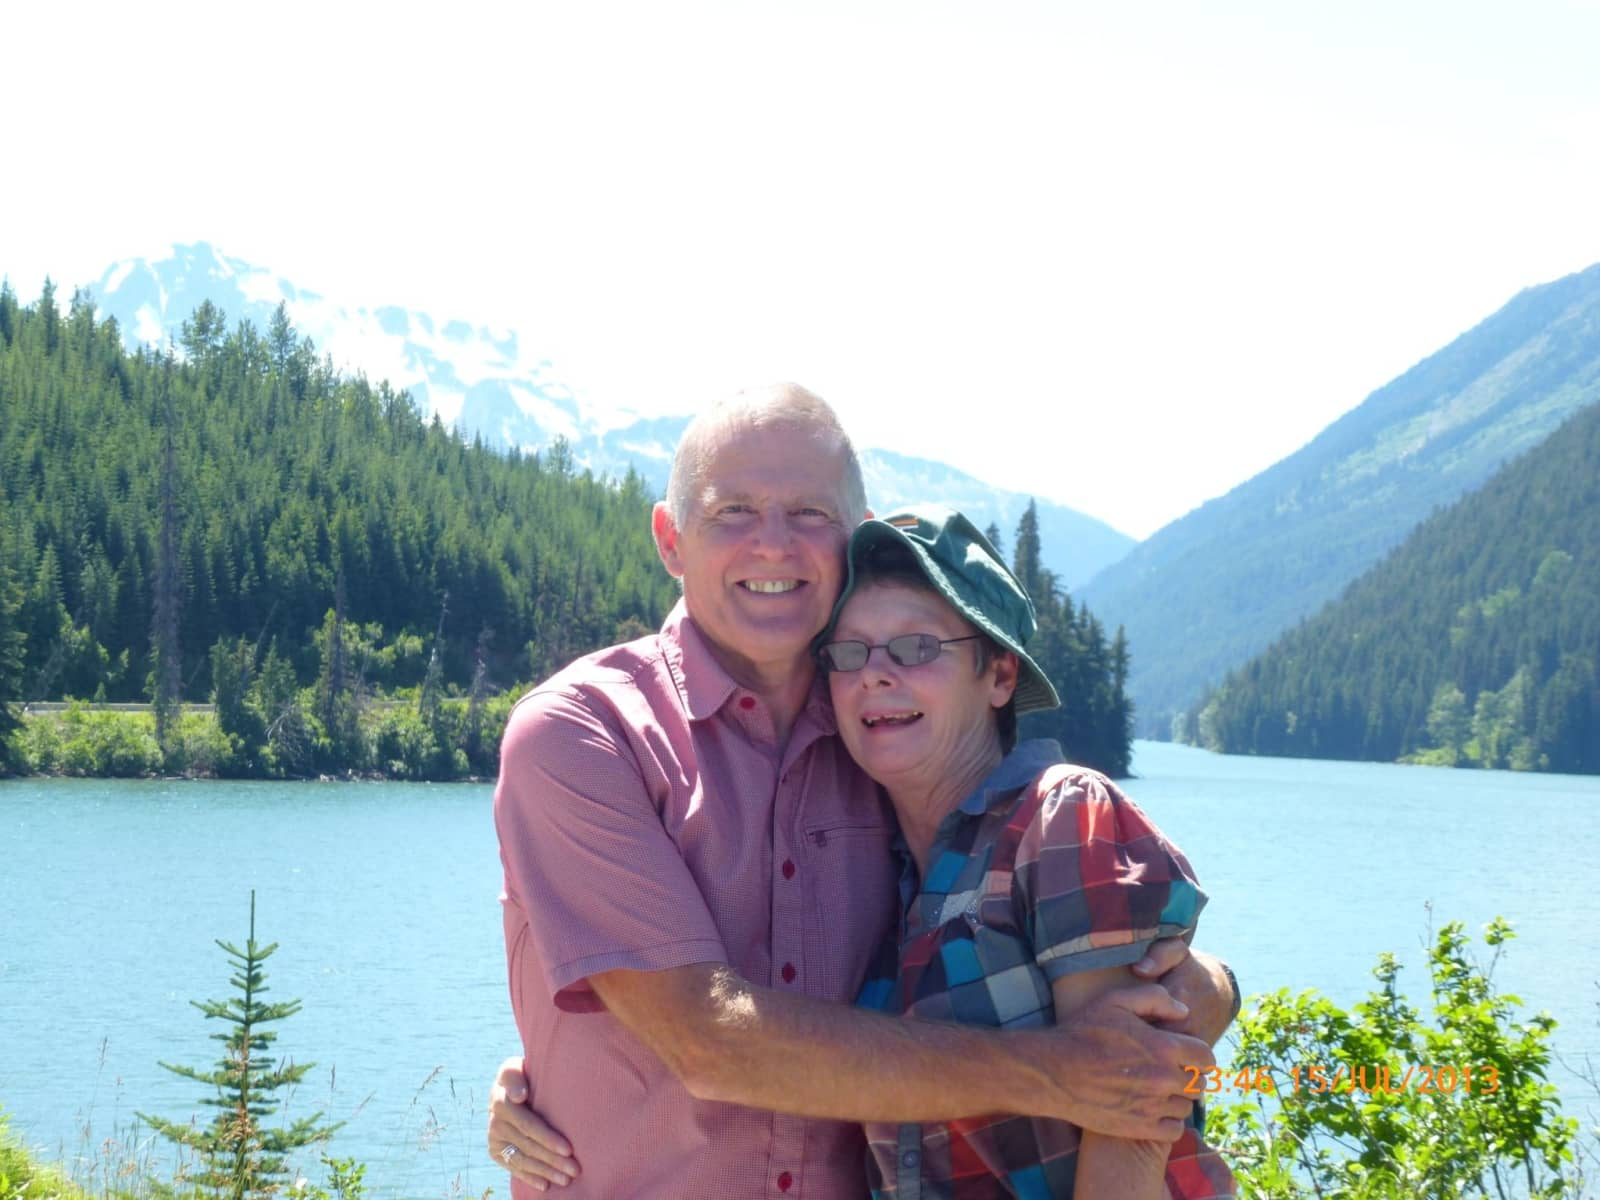 Derek & Maureen from Turangi, New Zealand